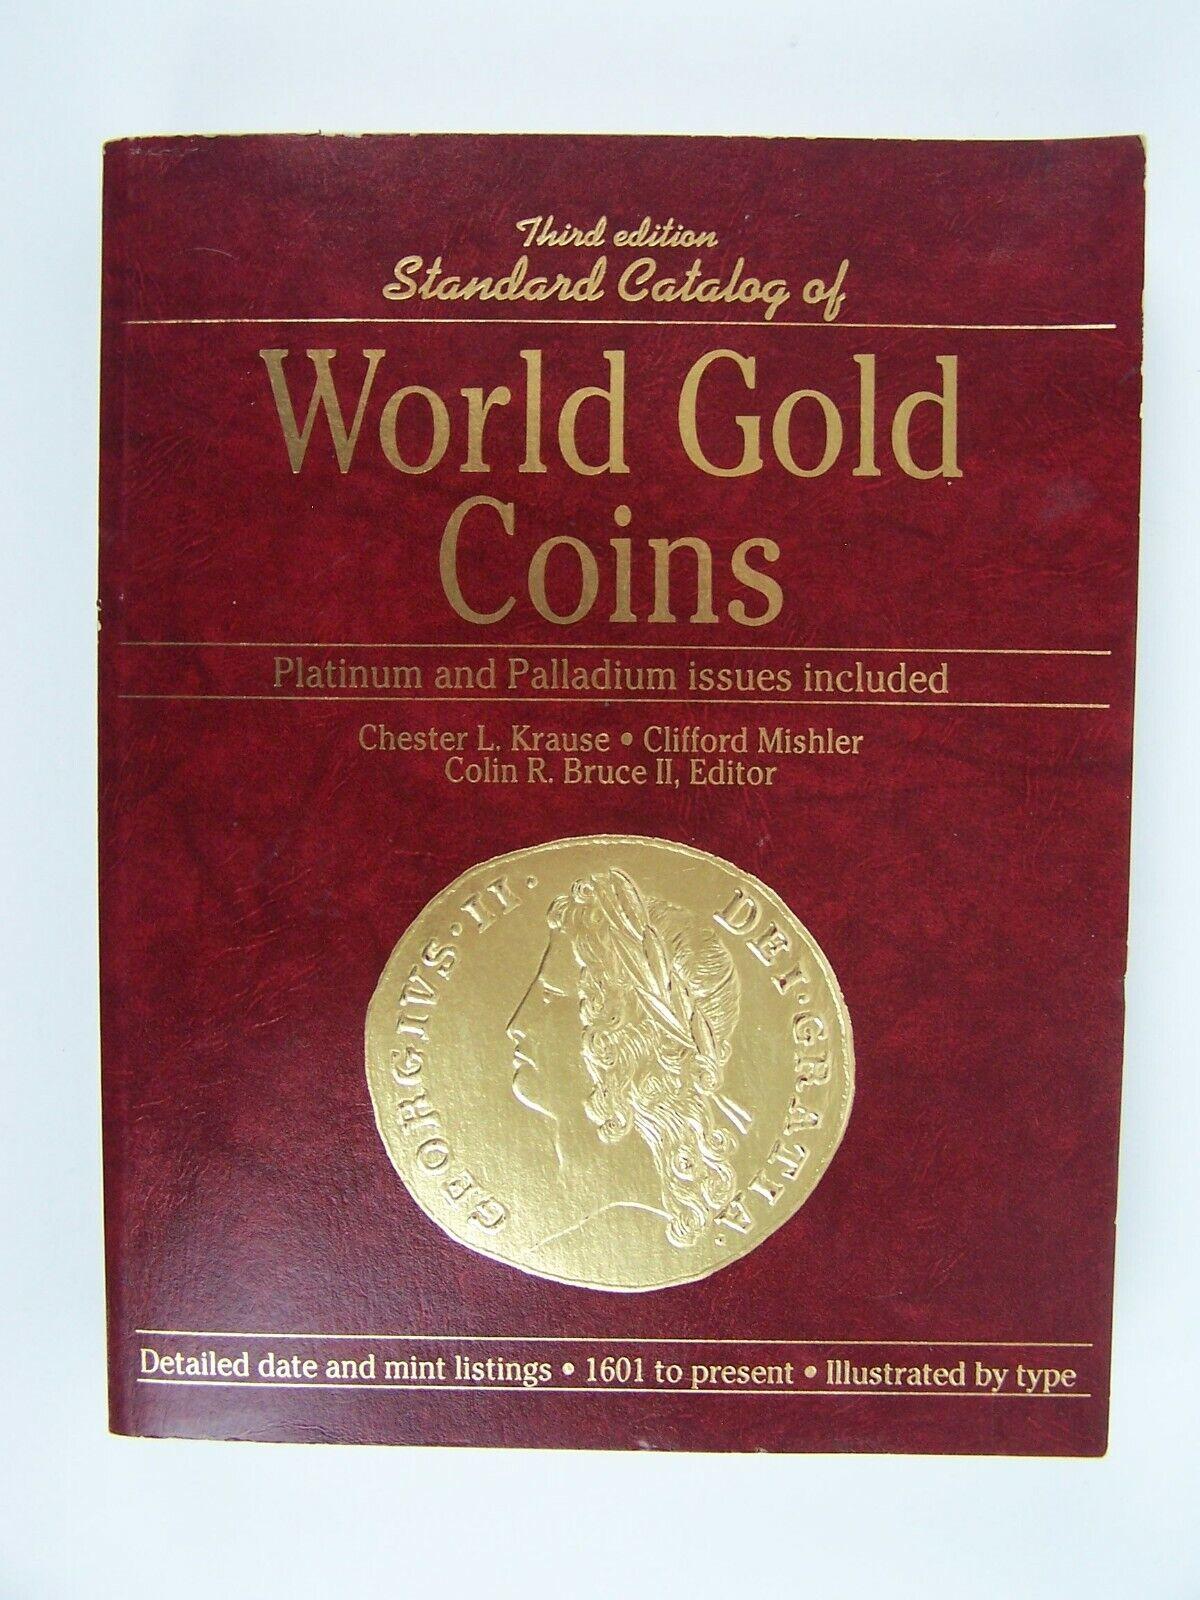 Standard Catalog of World Gold Coins Third Edition Plat